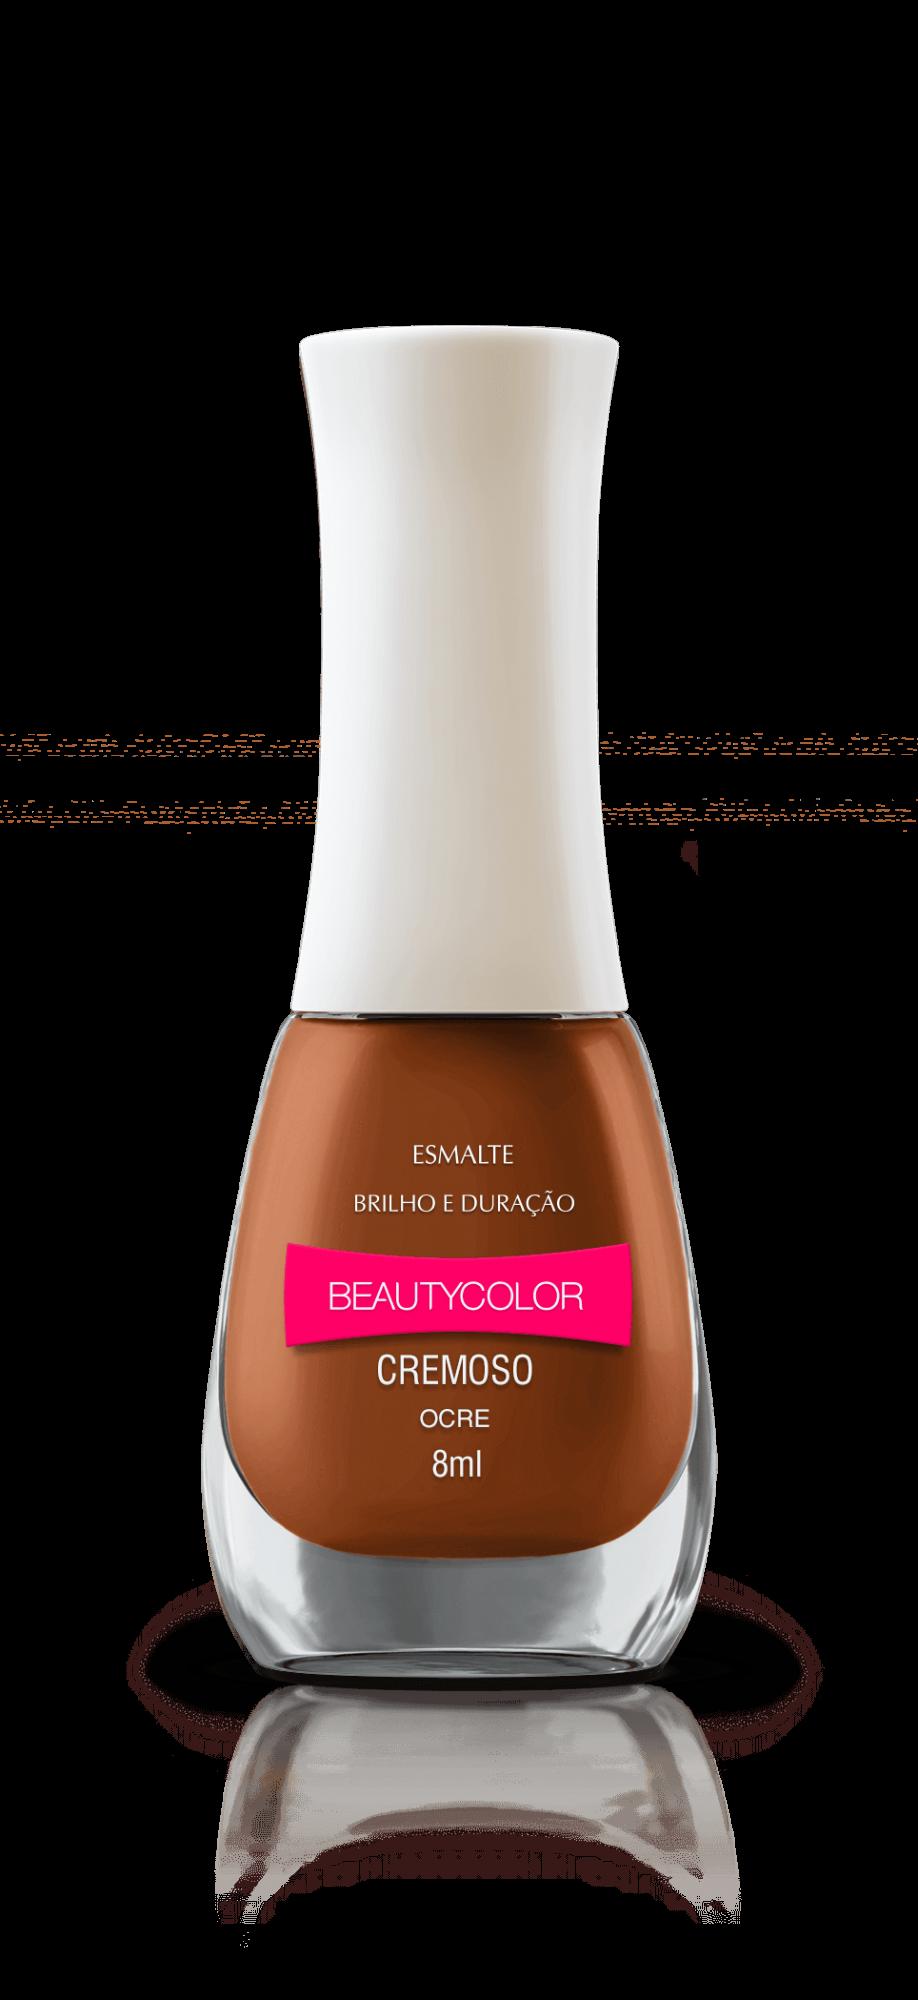 Ocre - Esmalte Beautycolor